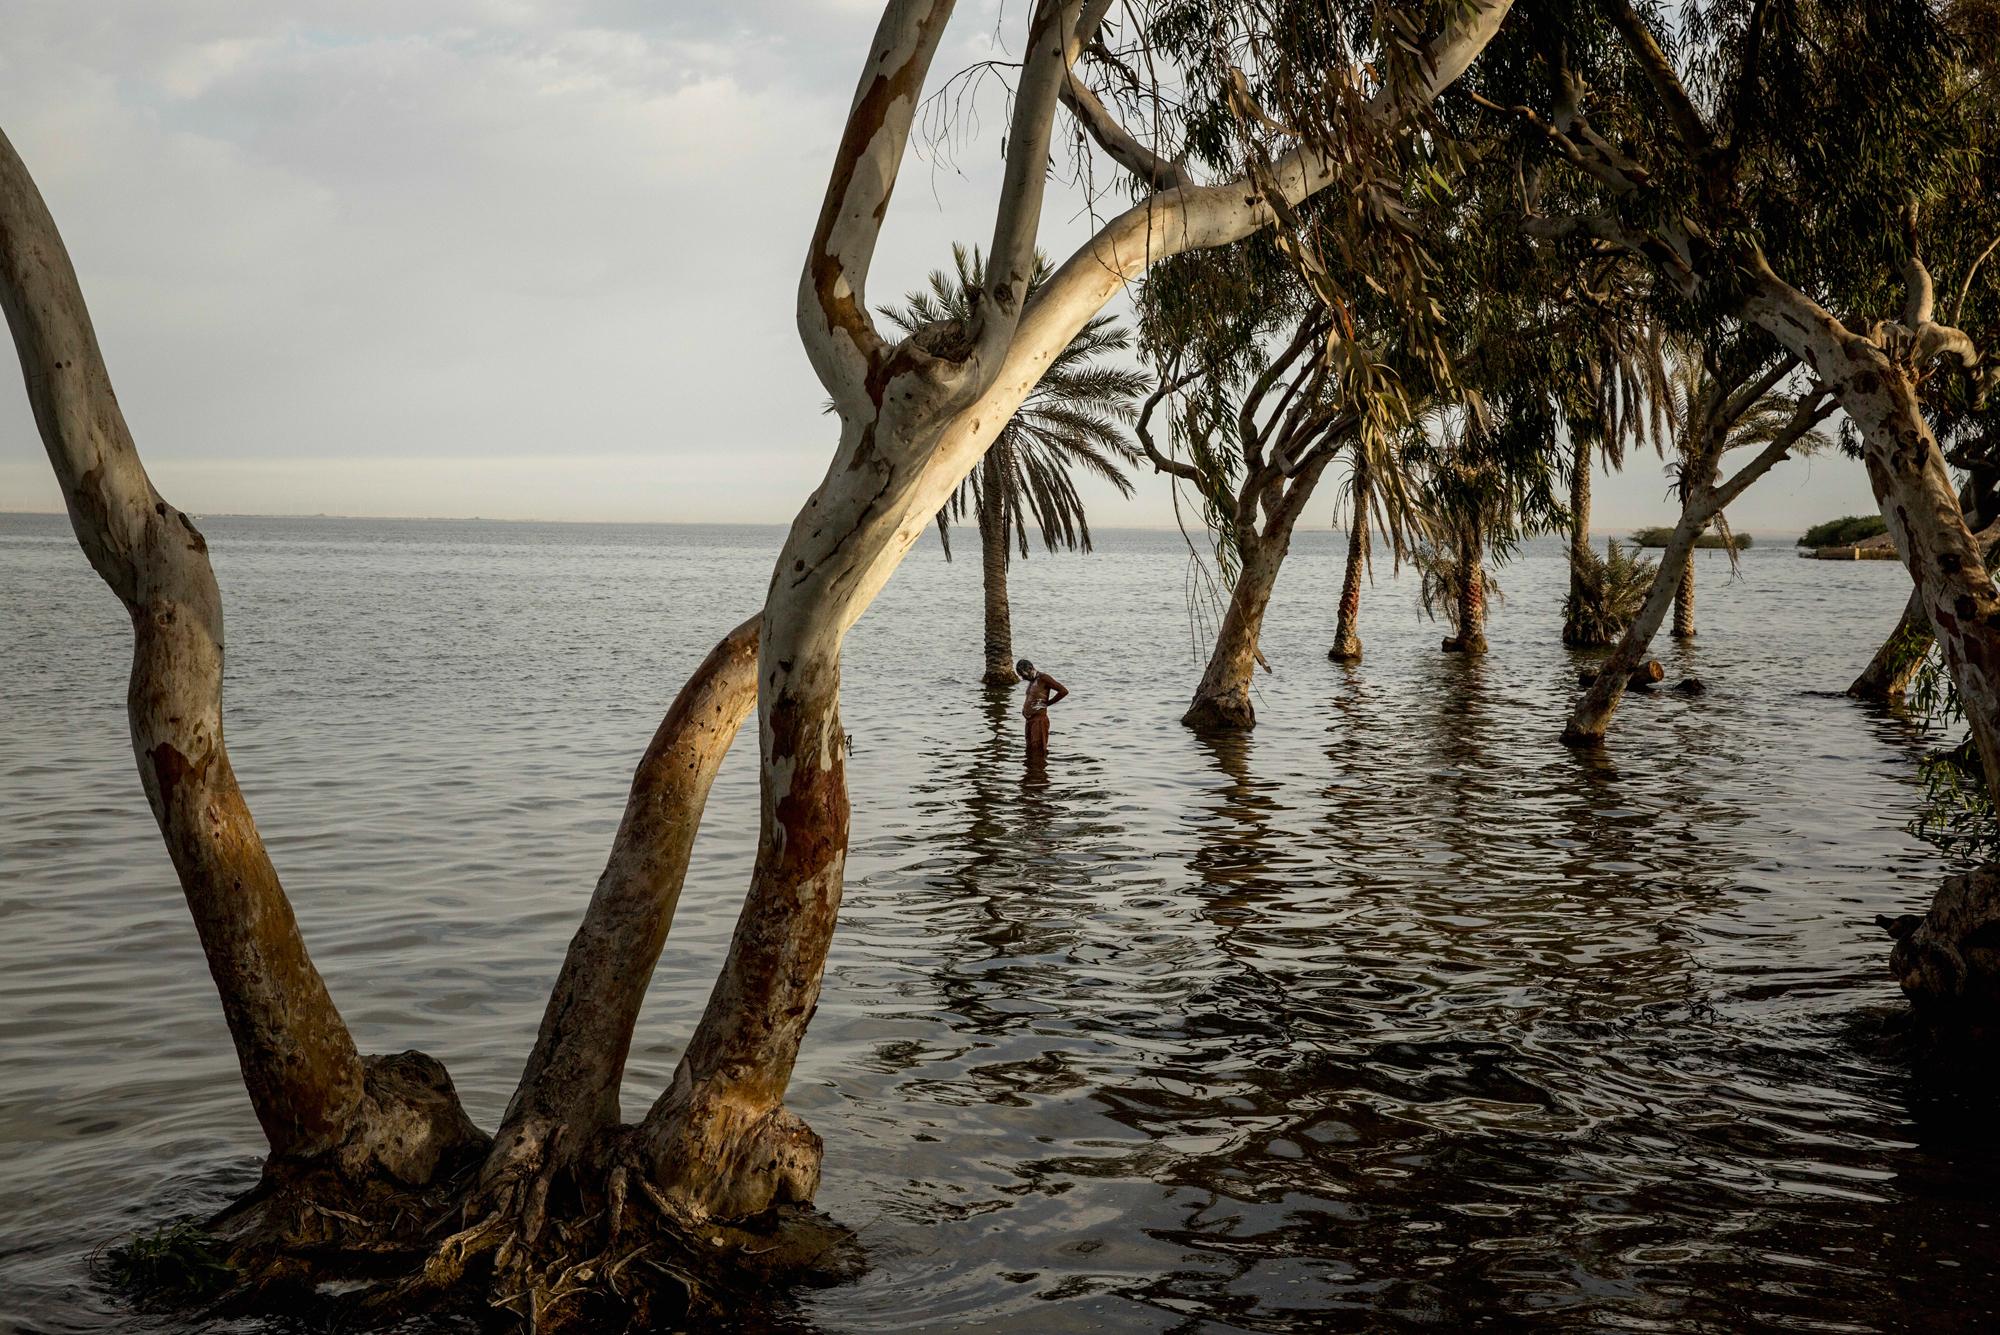 Keenjhar Lake in Thatta is a reservoir that serves the city of Karachi's 16.6 million inhabitant